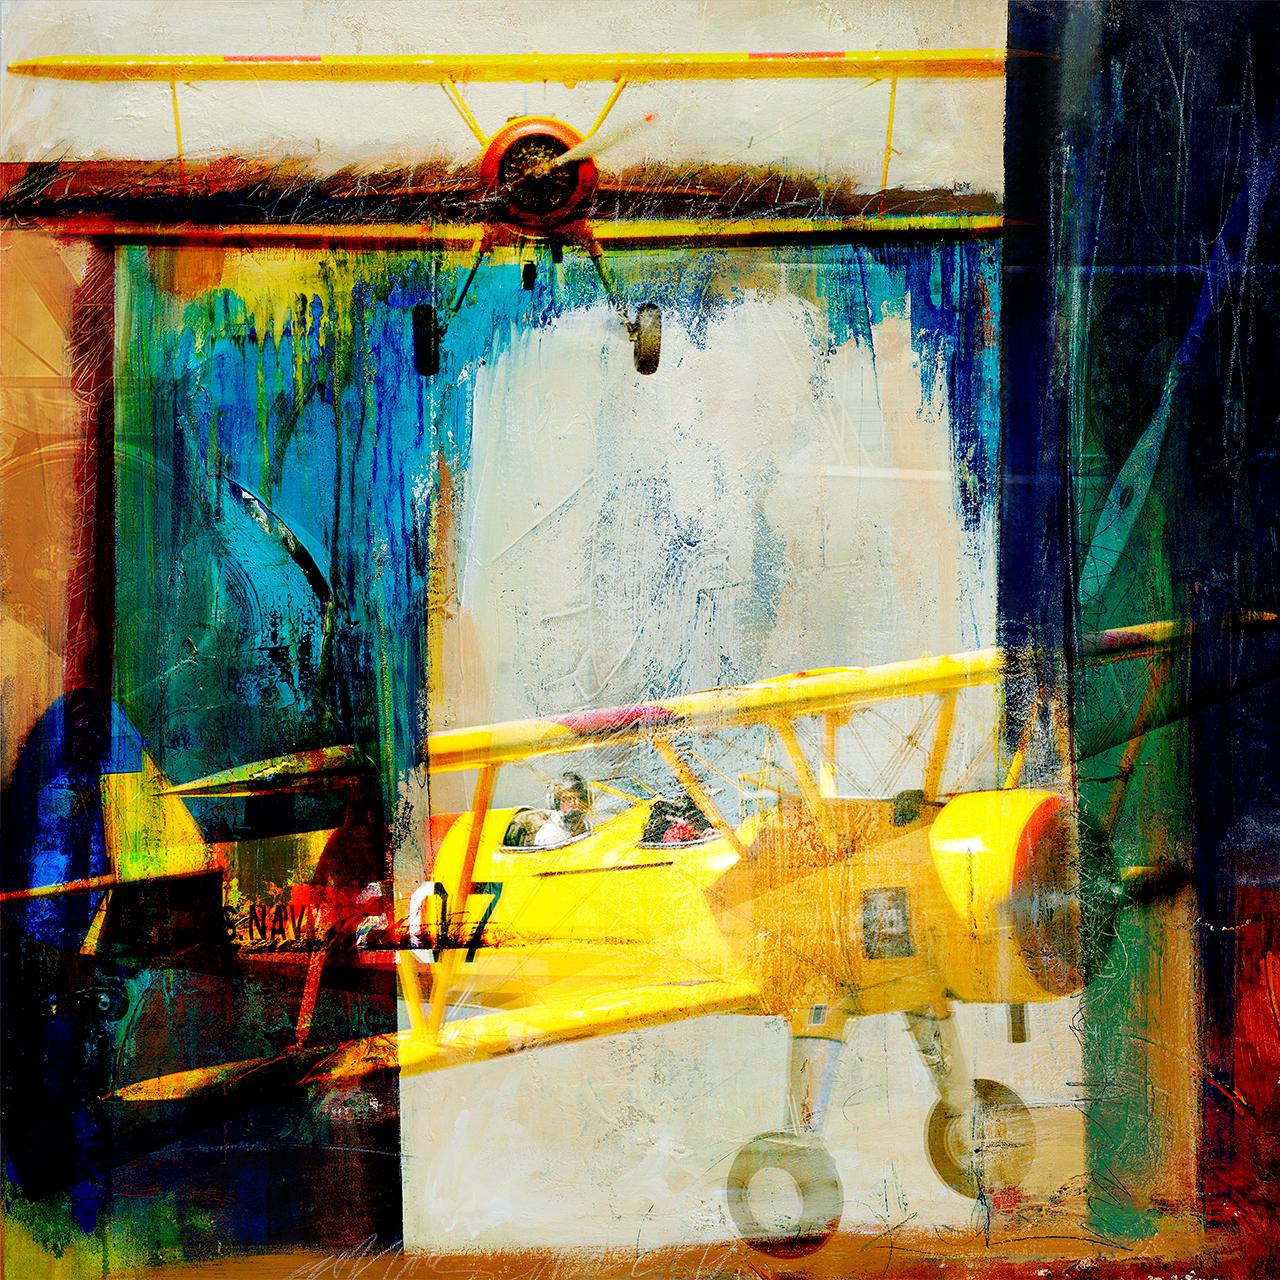 Aircraft 056 – Stearman | The Art of Aircraft